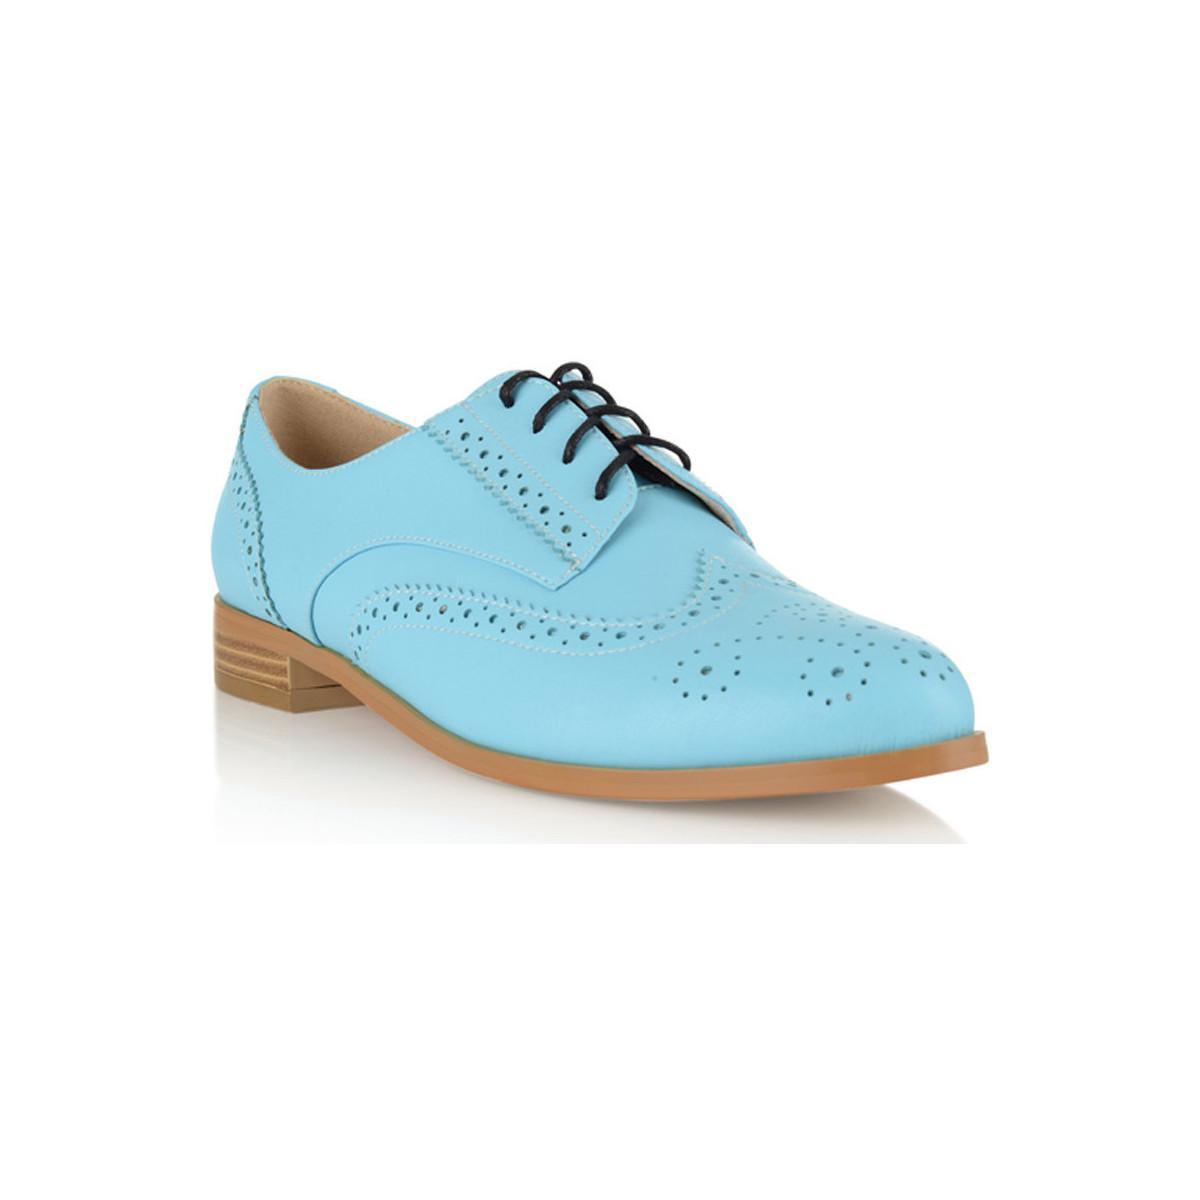 Yull Shoes Derbies Bonnieg r9oRDg